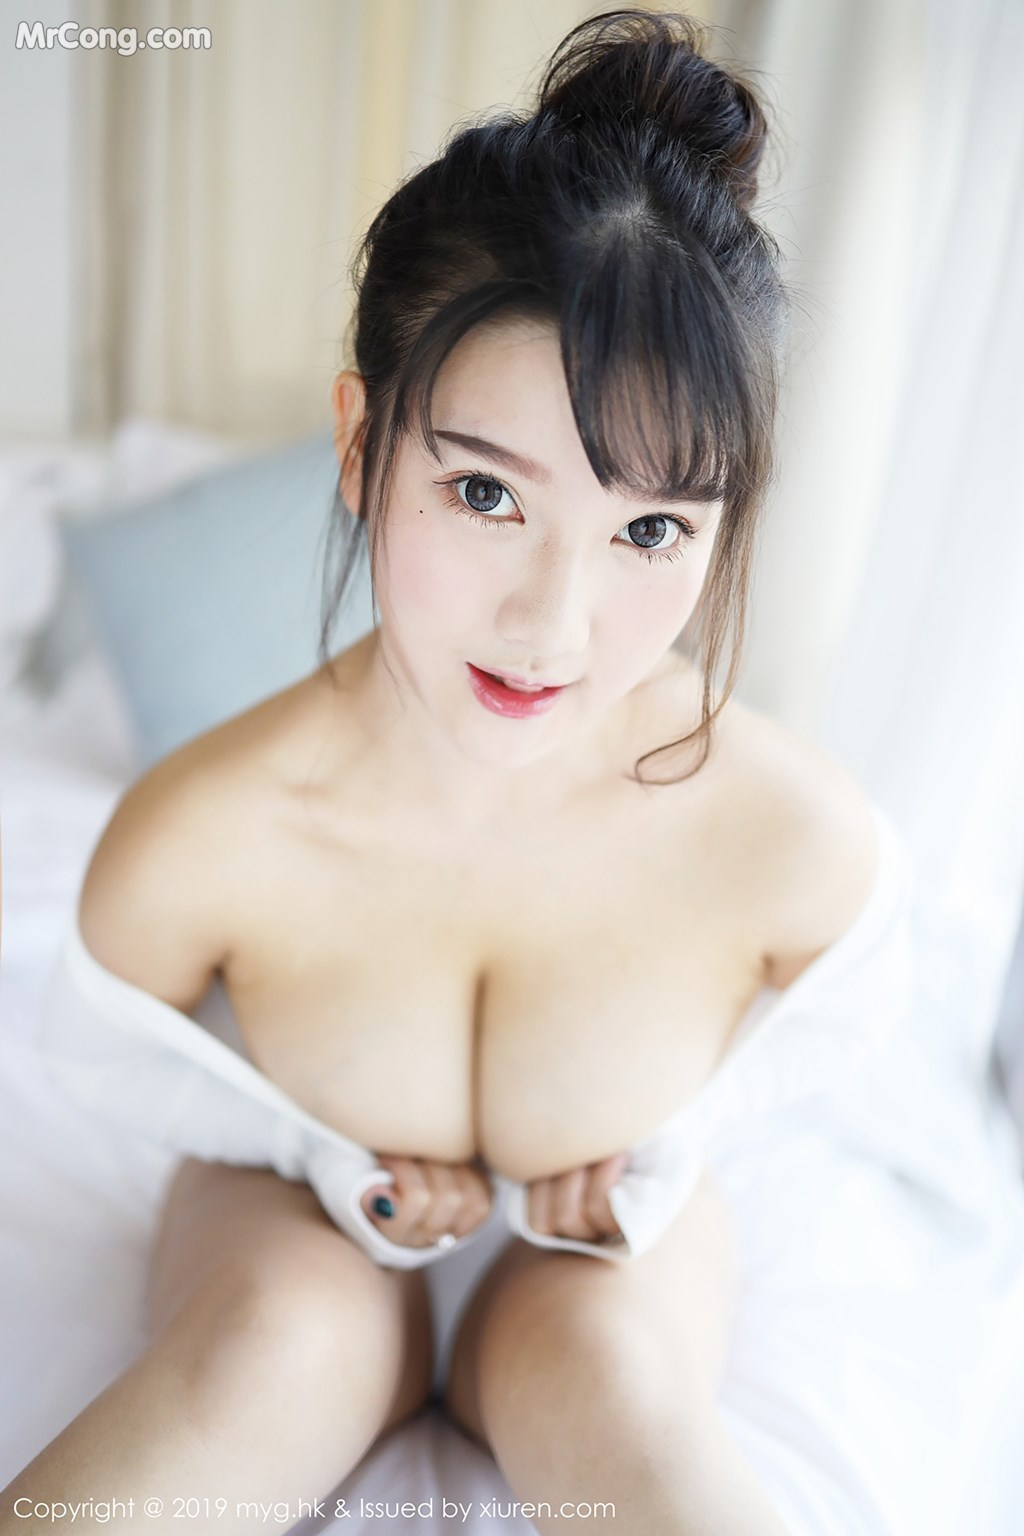 Image MyGirl-Vol.342-Xiao-You-Nai-MrCong.com-015 in post MyGirl Vol.342: Người mẫu Xiao You Nai (小尤奈) (41 ảnh)